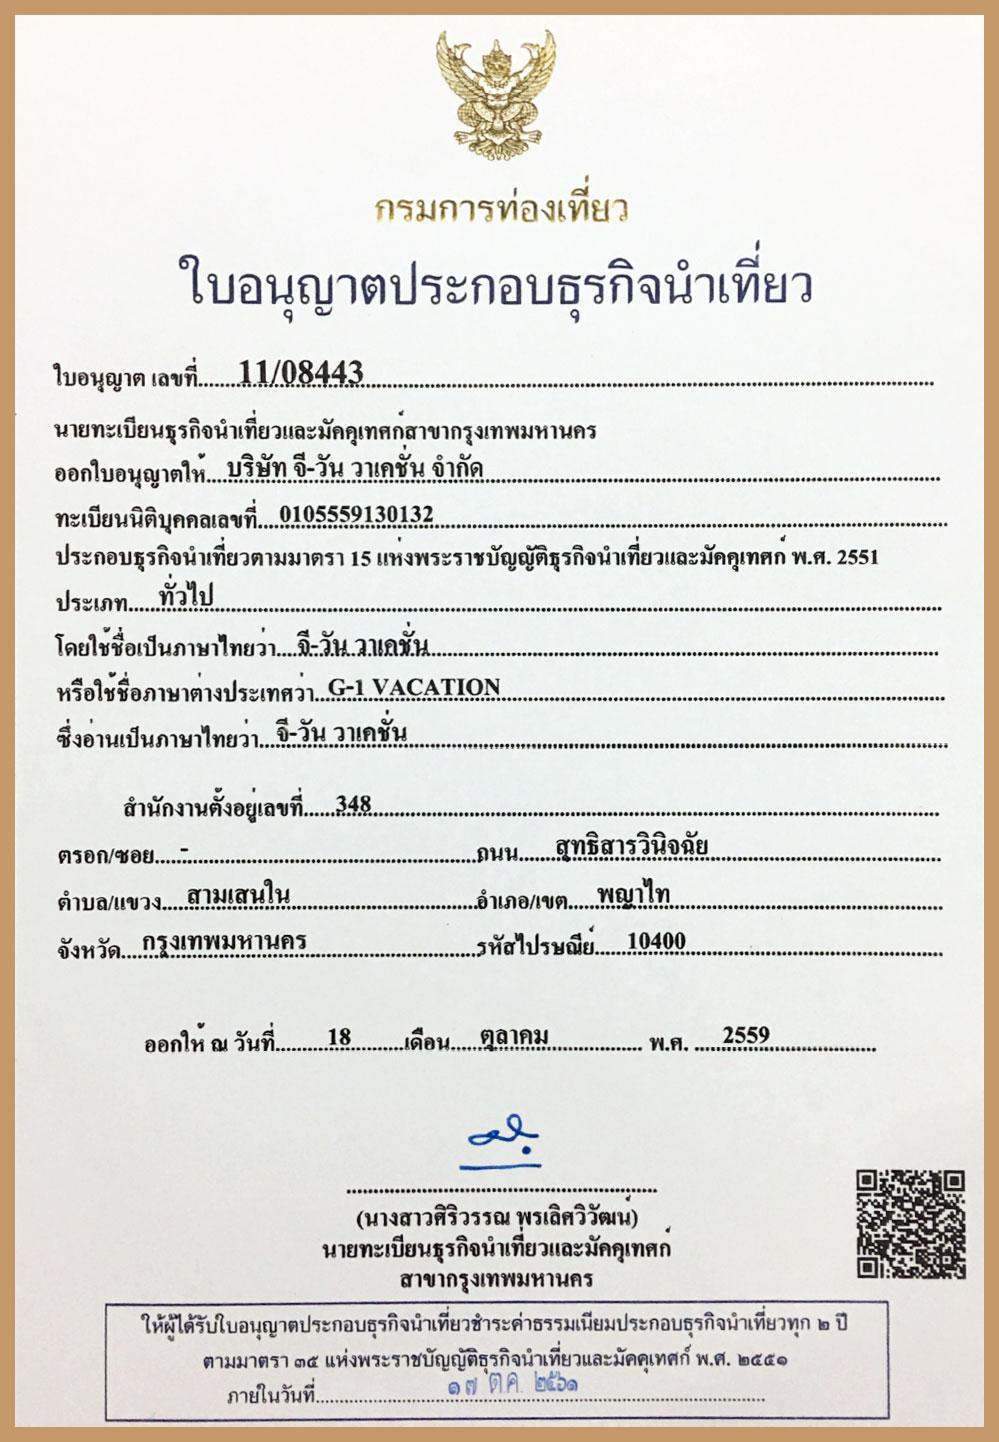 G-1 Vacation Co.,Ltd. TAT License : 11/08443